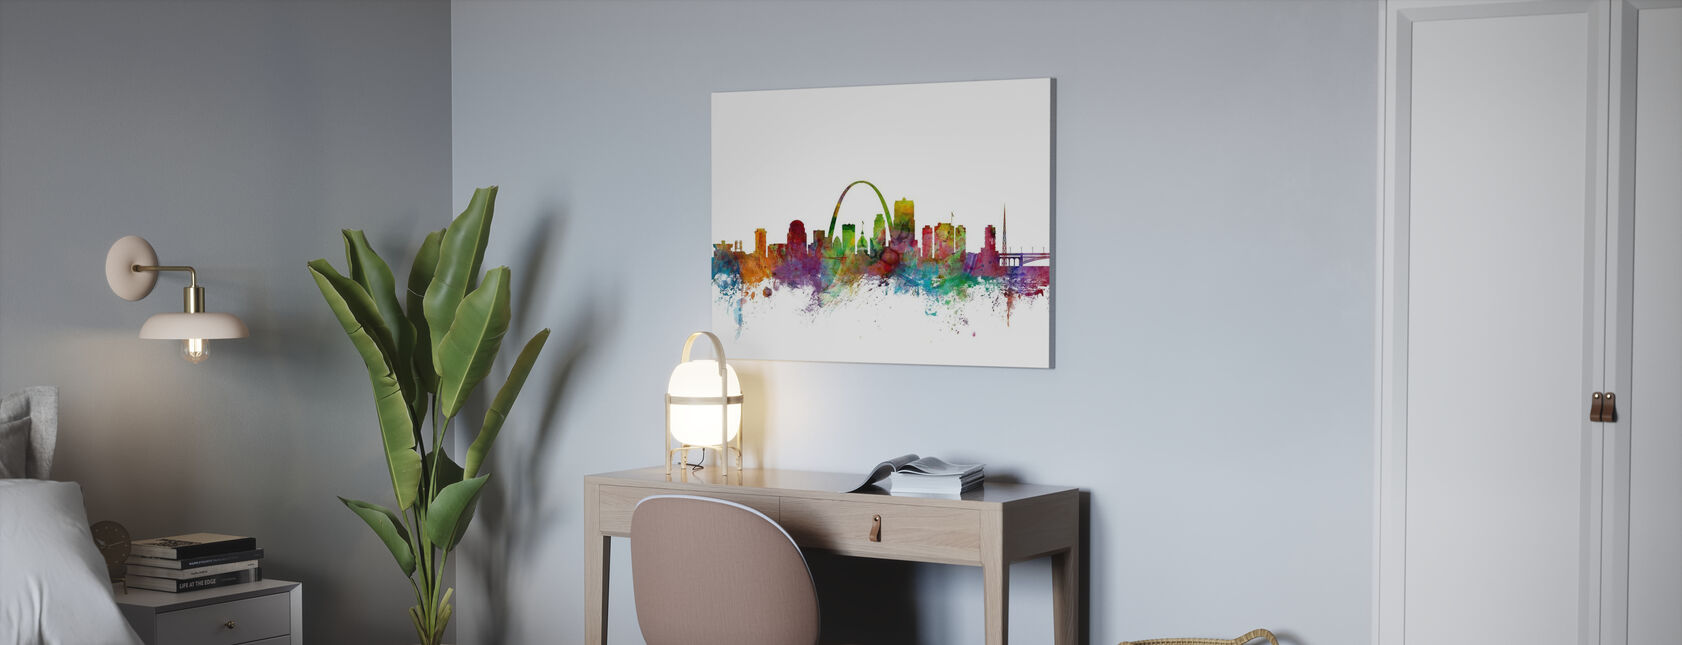 St Louis Missouri Skyline - Canvas print - Office